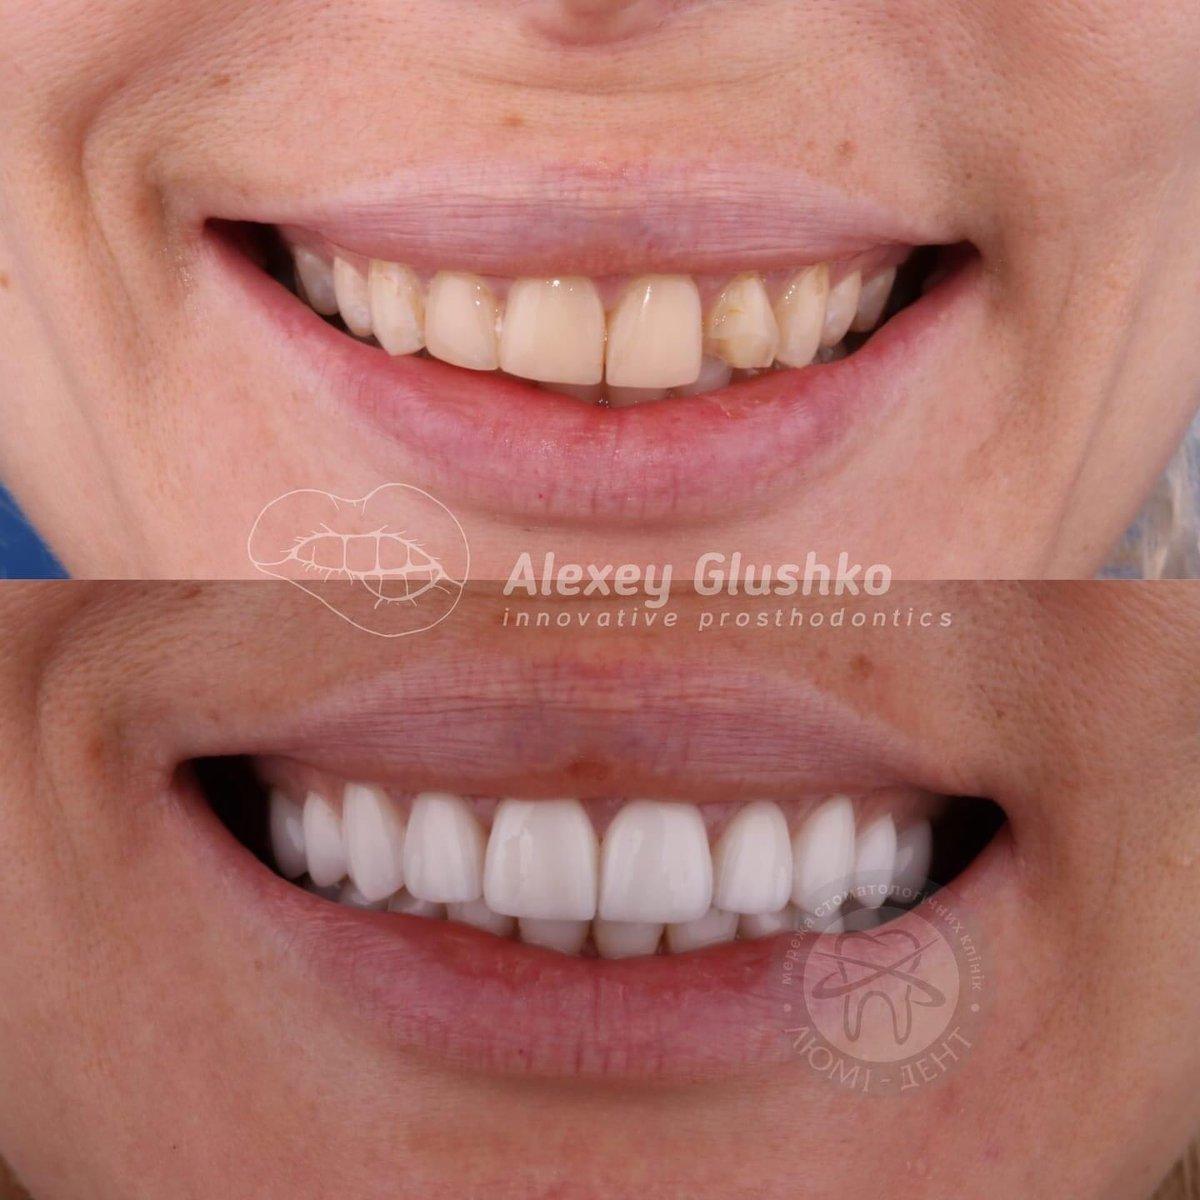 STA-анестезия: новые технологии в современной стоматологии https://t.co/0zuldbgfyN https://t.co/3uMPLOhXuU